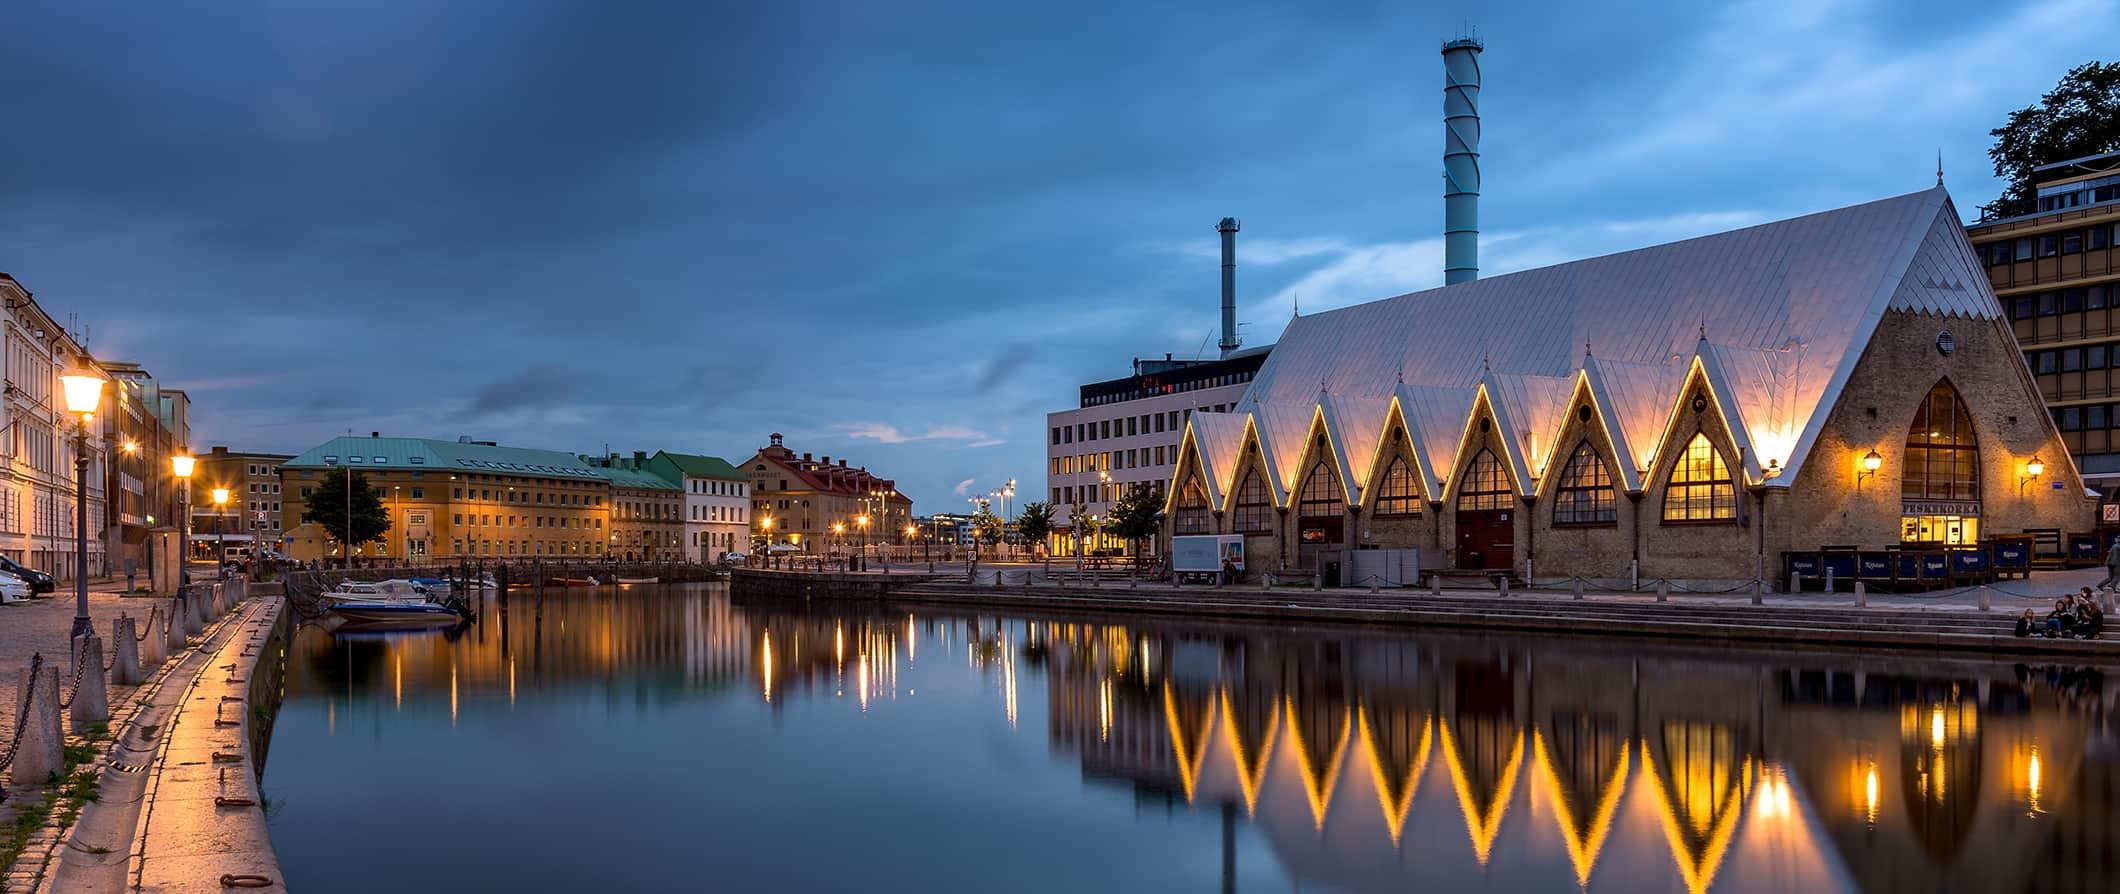 Gothenburg's waterfront lit up at night